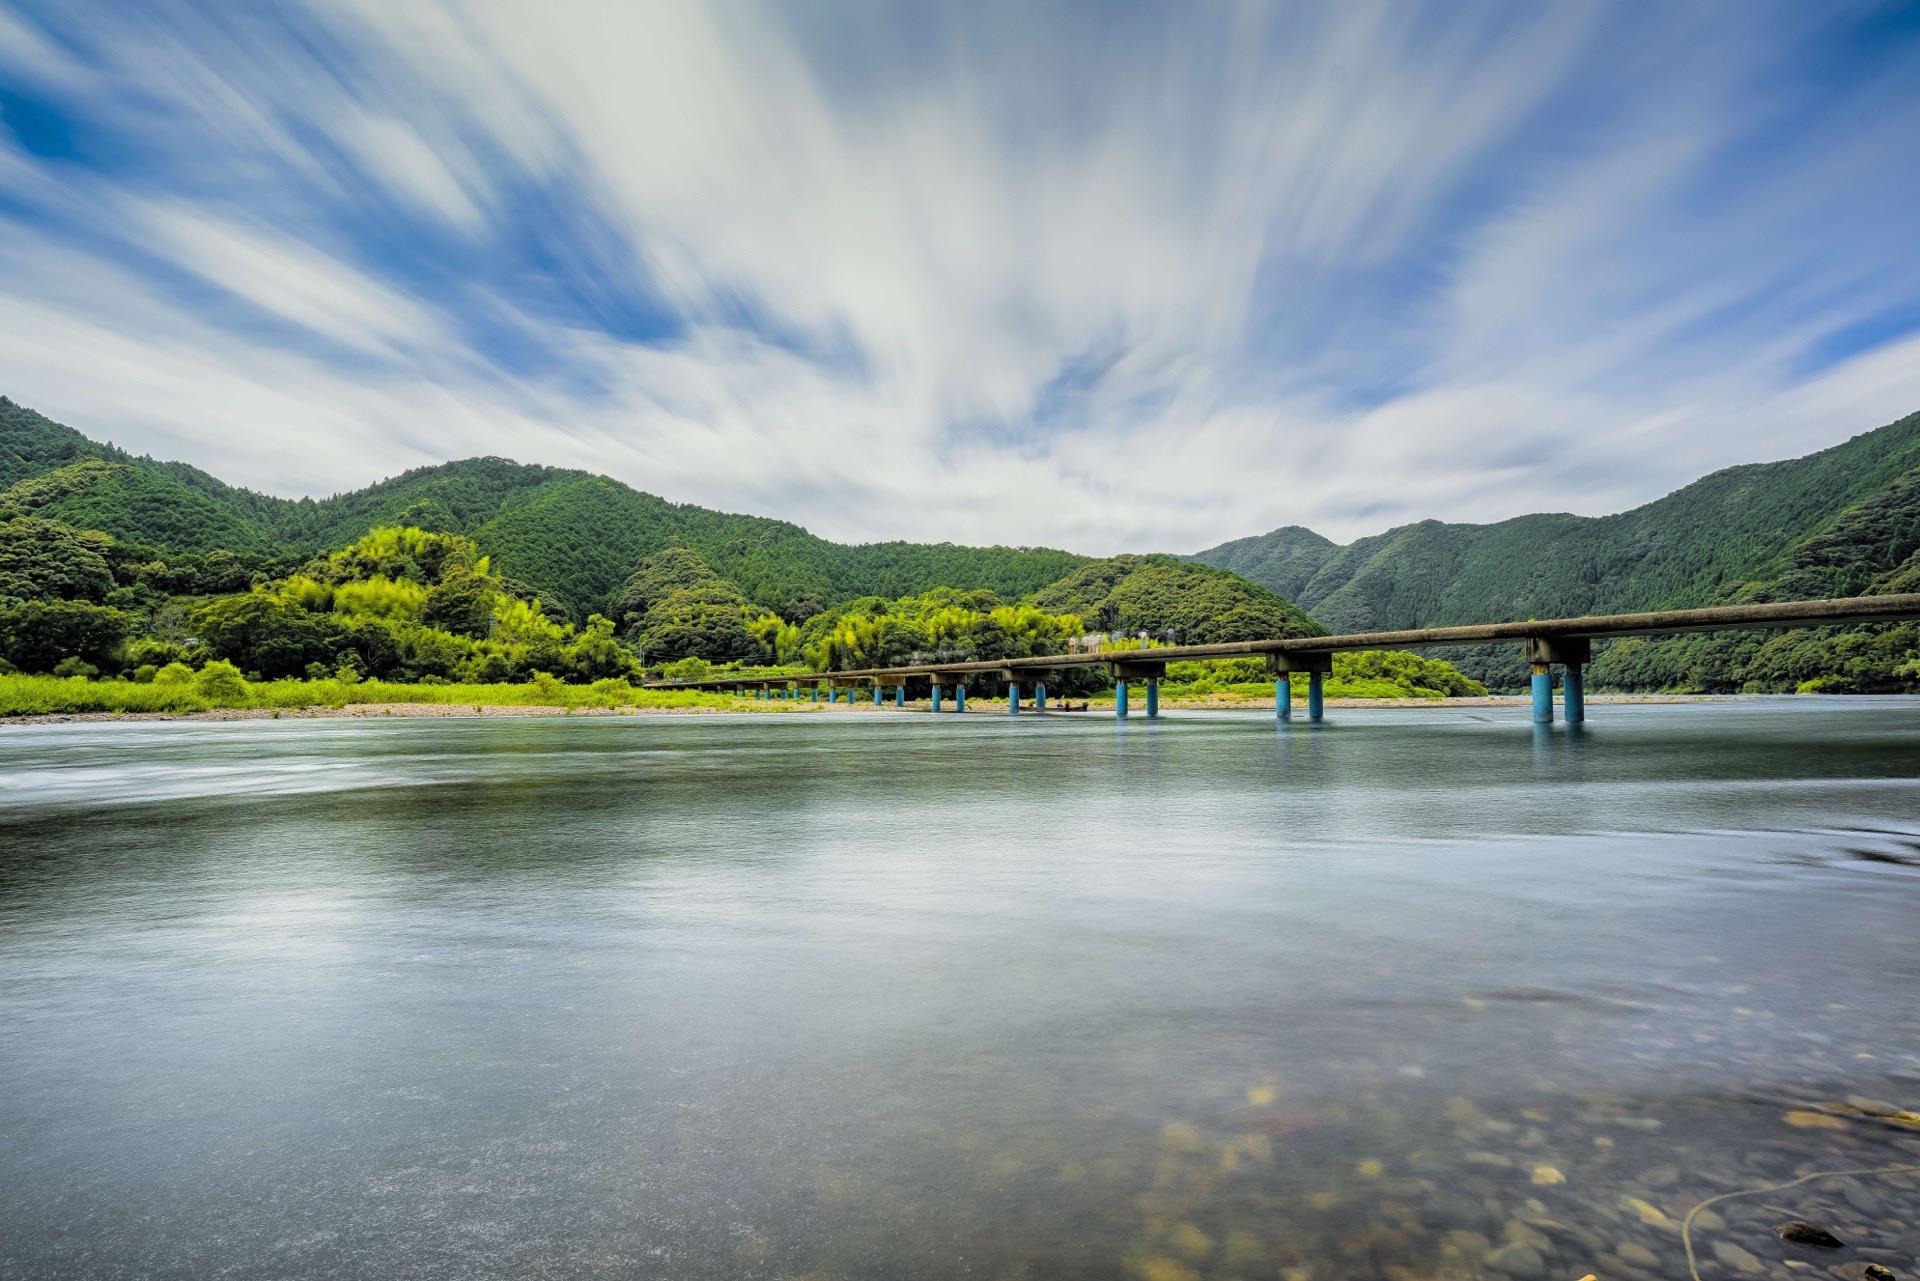 Kachima Chinka Bridge